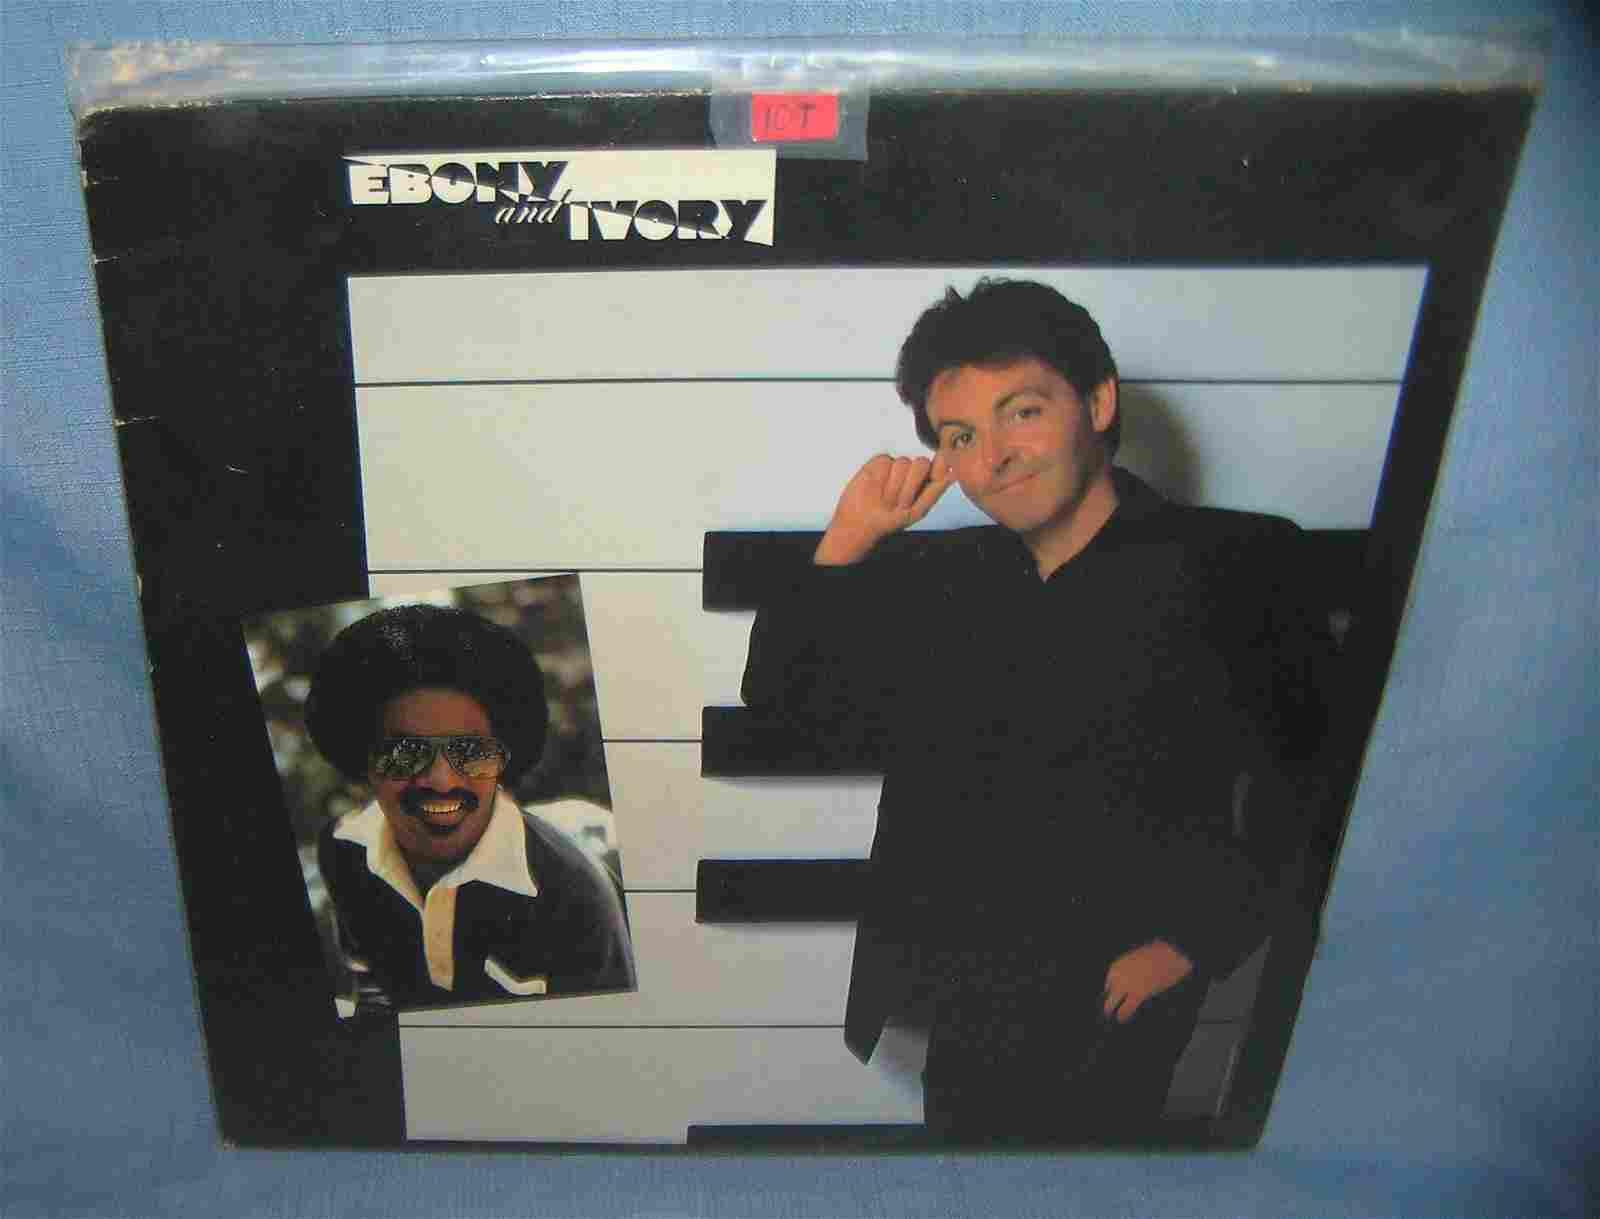 Ebony and Ivory record album by Paul McCartney